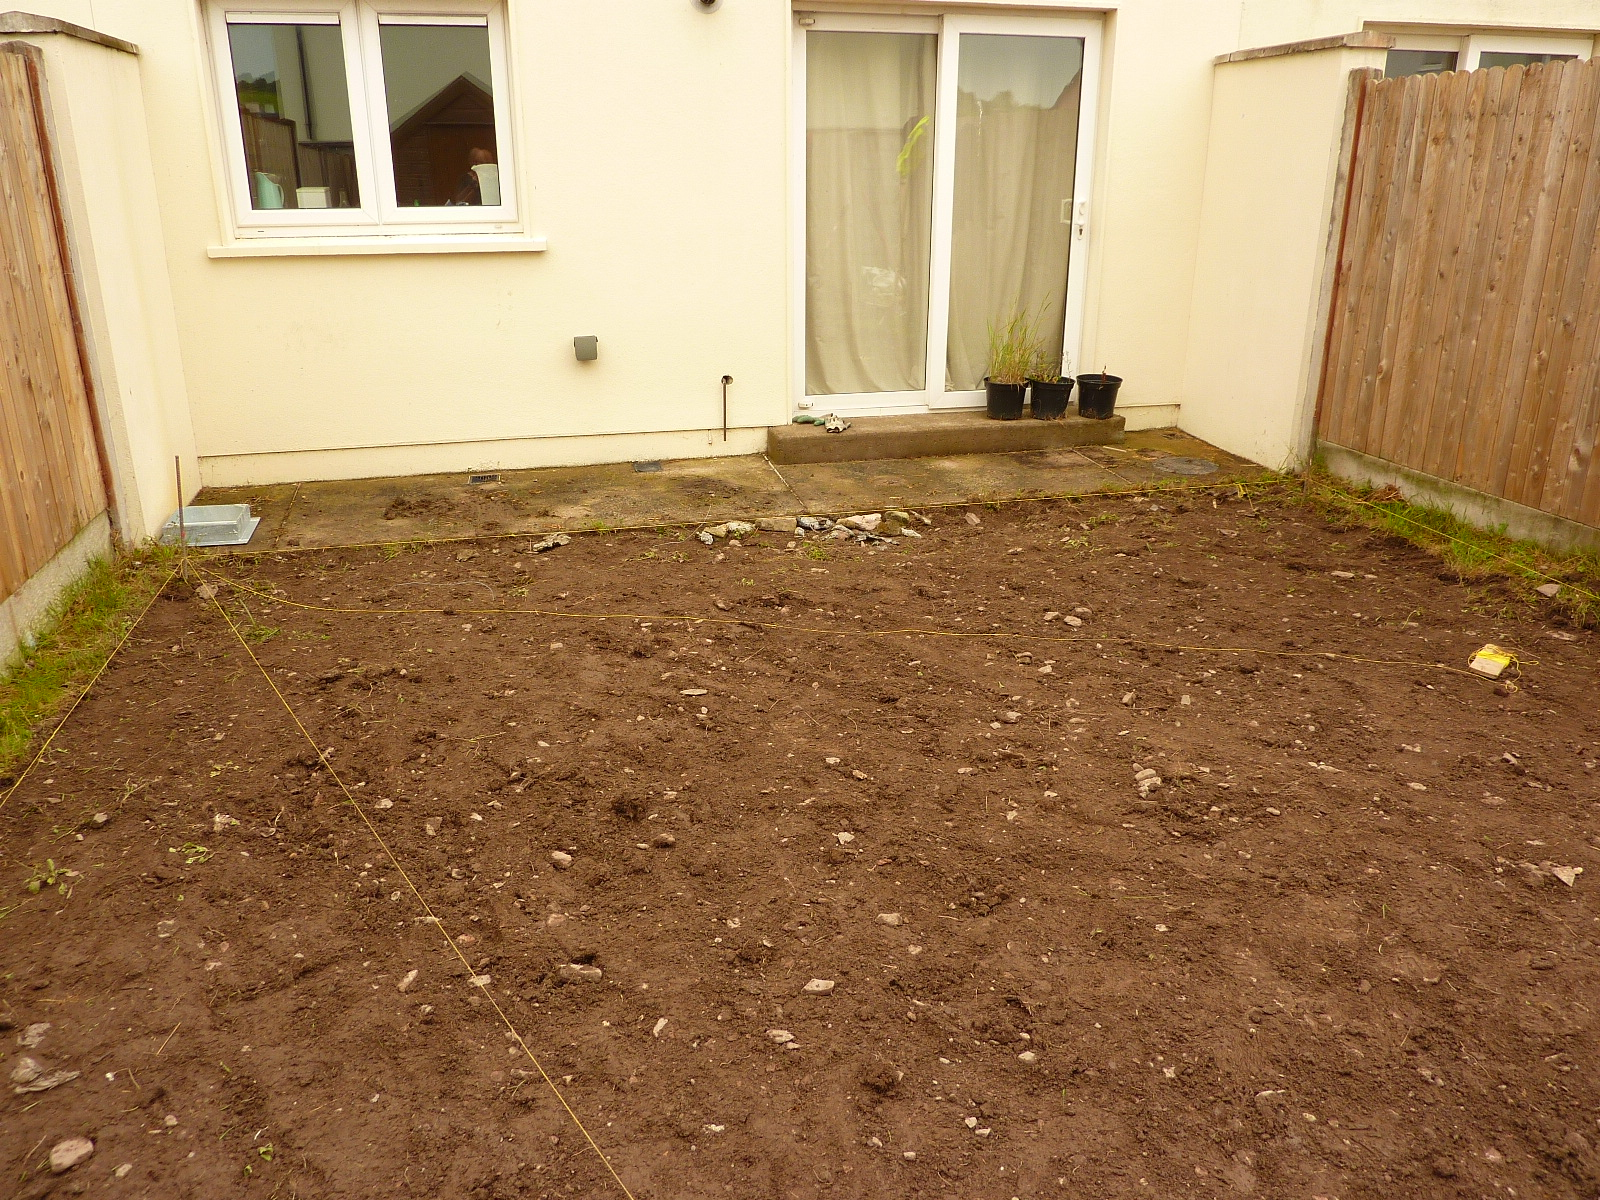 Low Maintenance Garden Patio – Paving For You